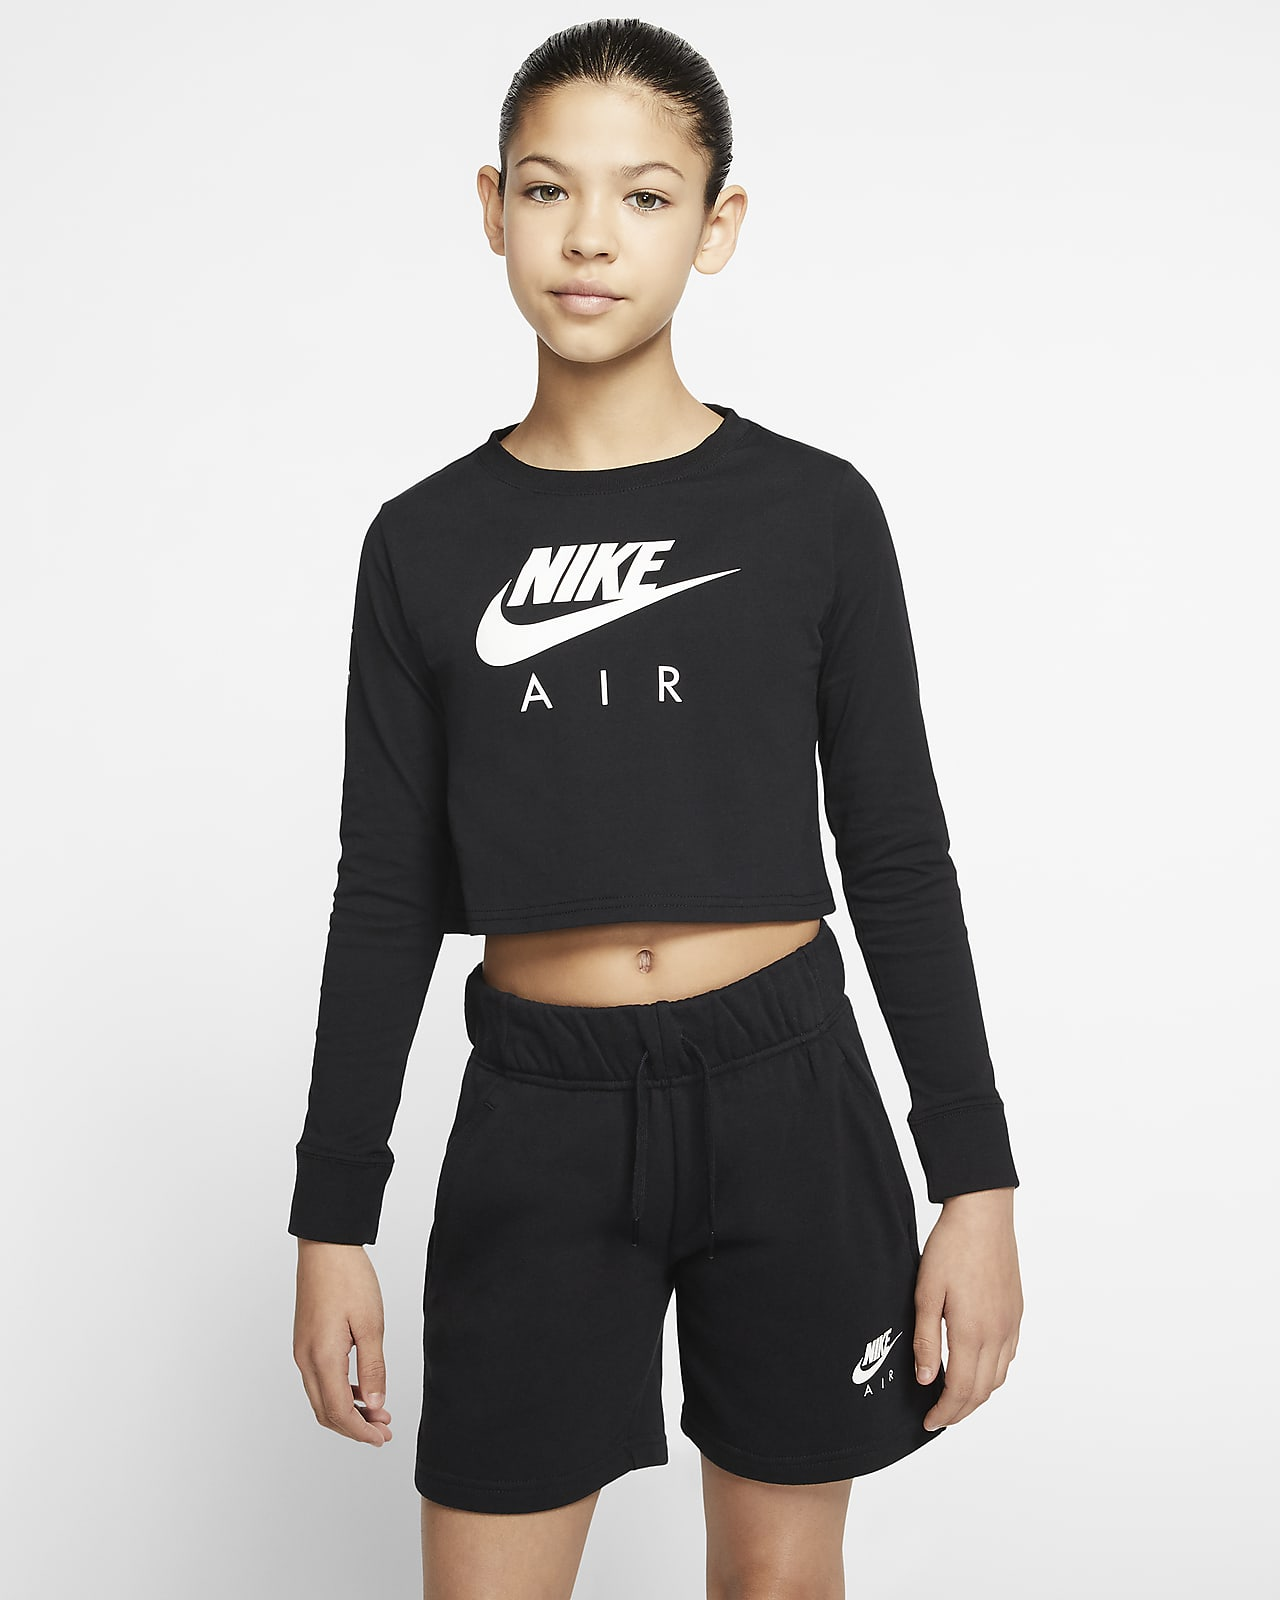 Långärmad t shirt Nike Air för ungdom (tjejer). Nike SE